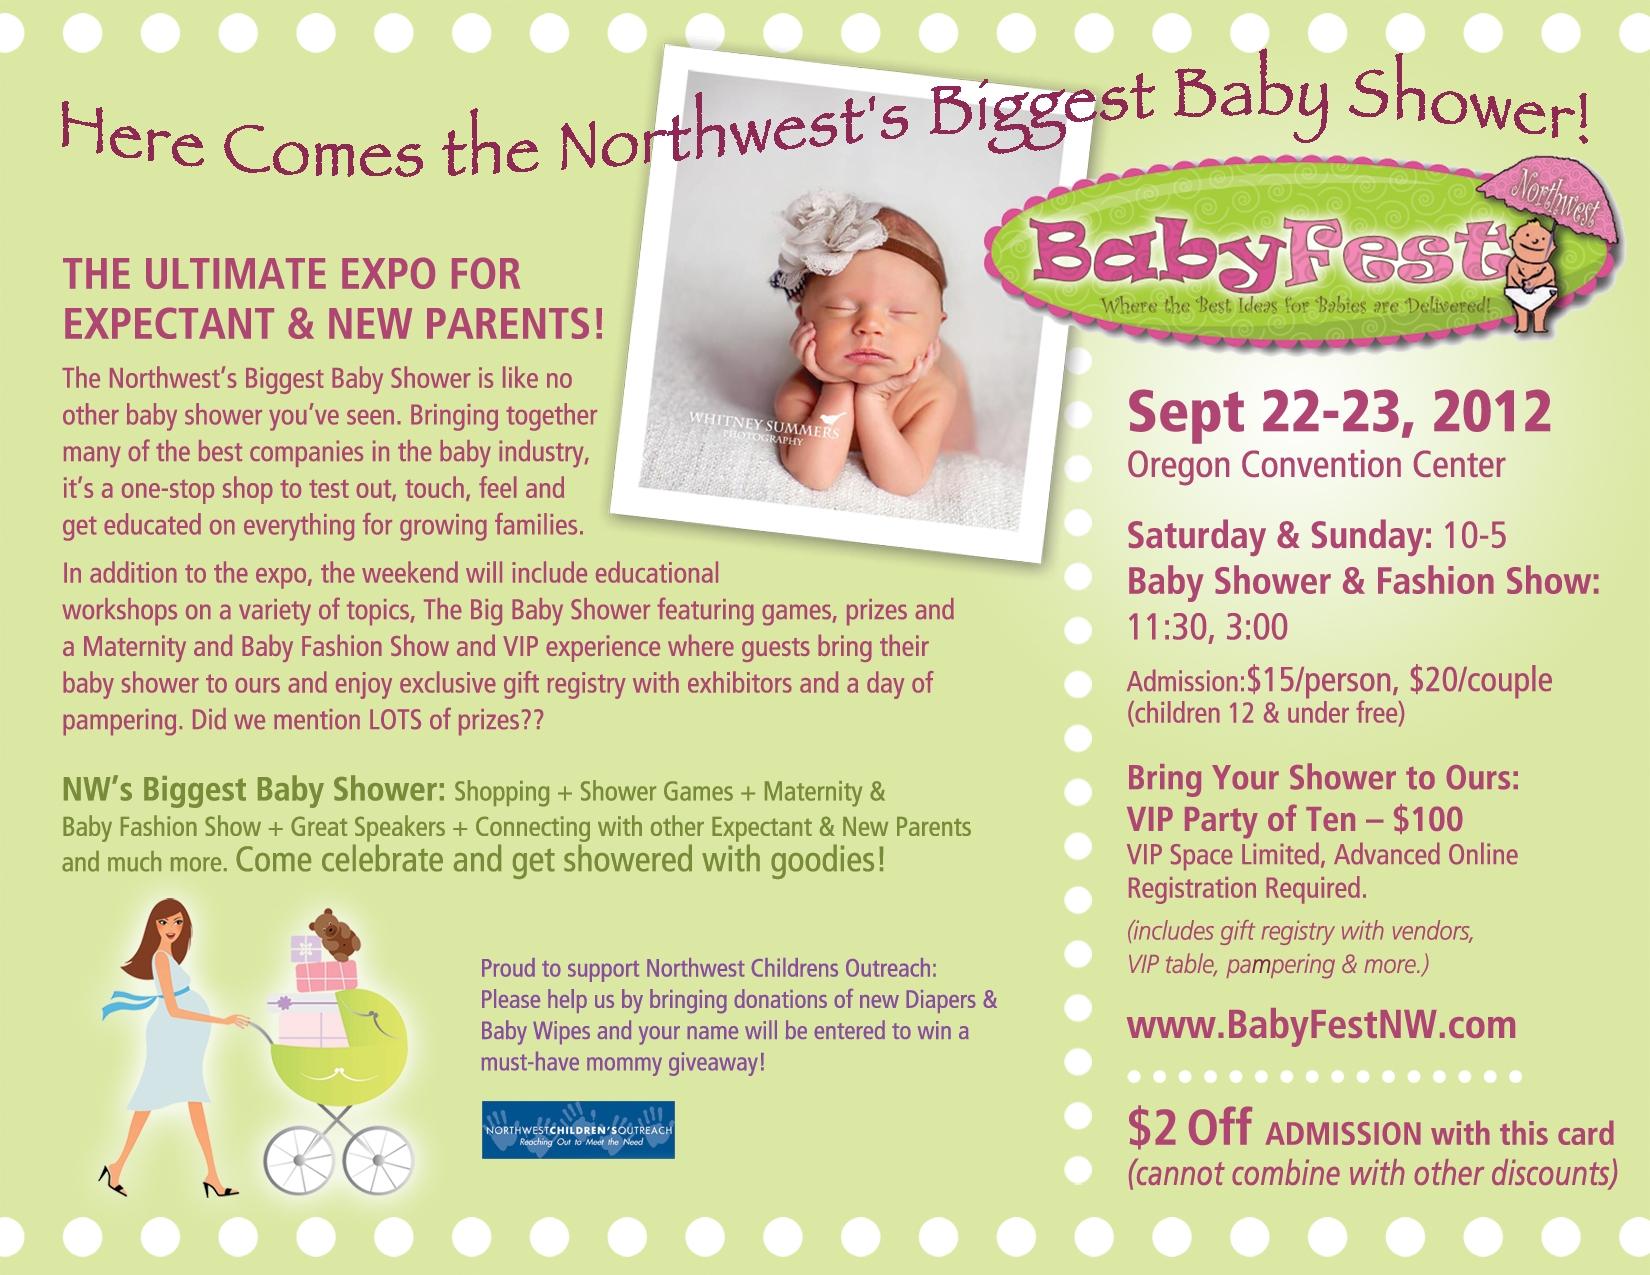 Portland_Family_Fun_BabyFest_2012